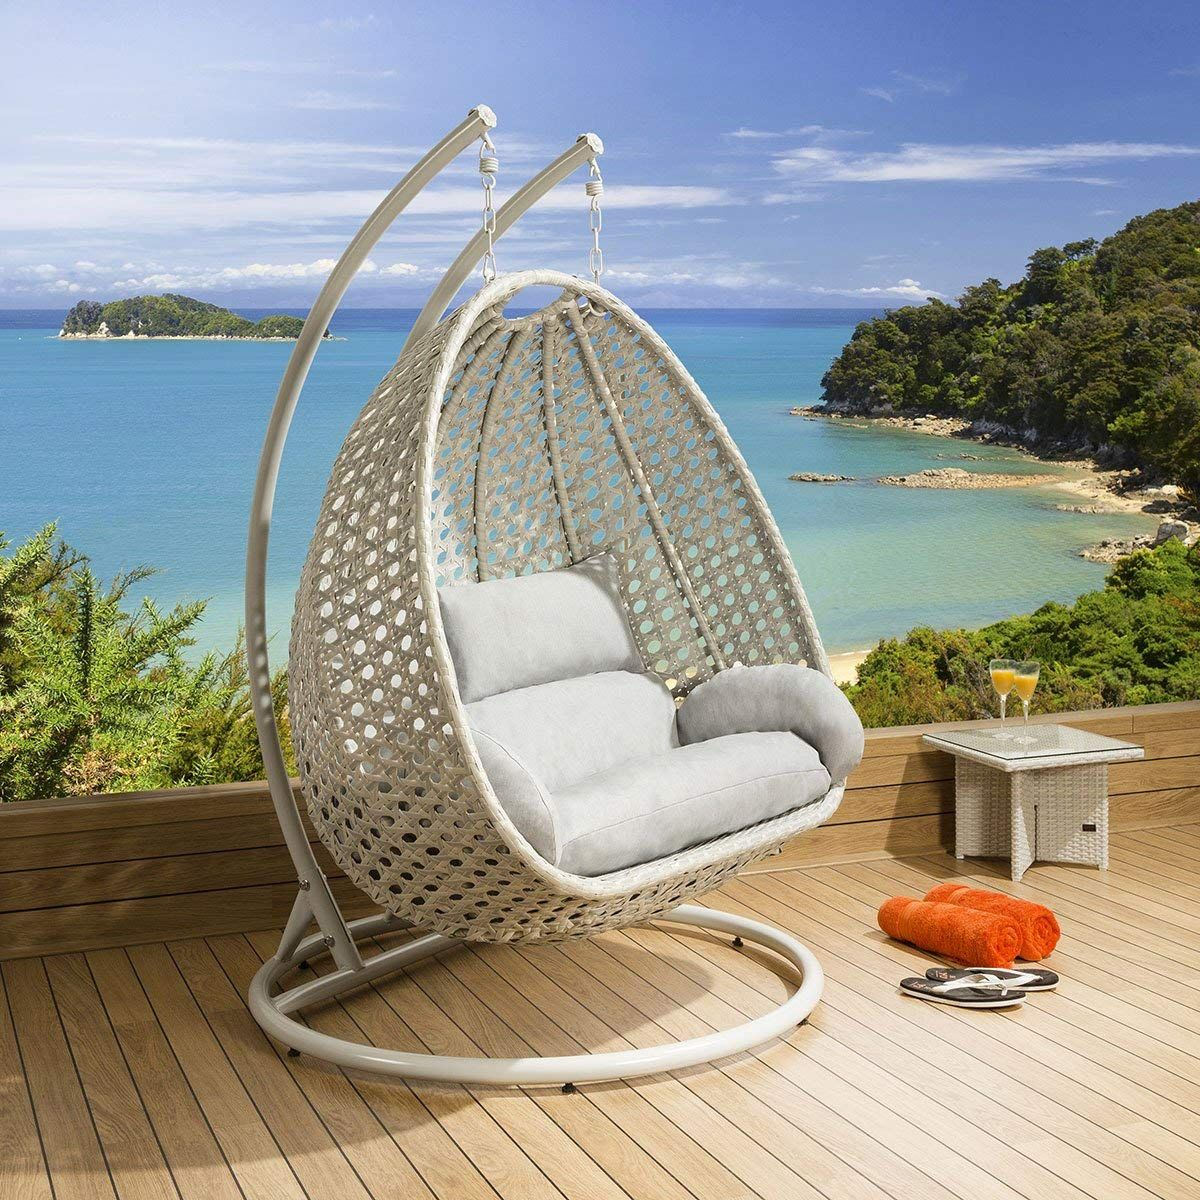 Luxury outdoor 2 person garden pod hanging chair swing